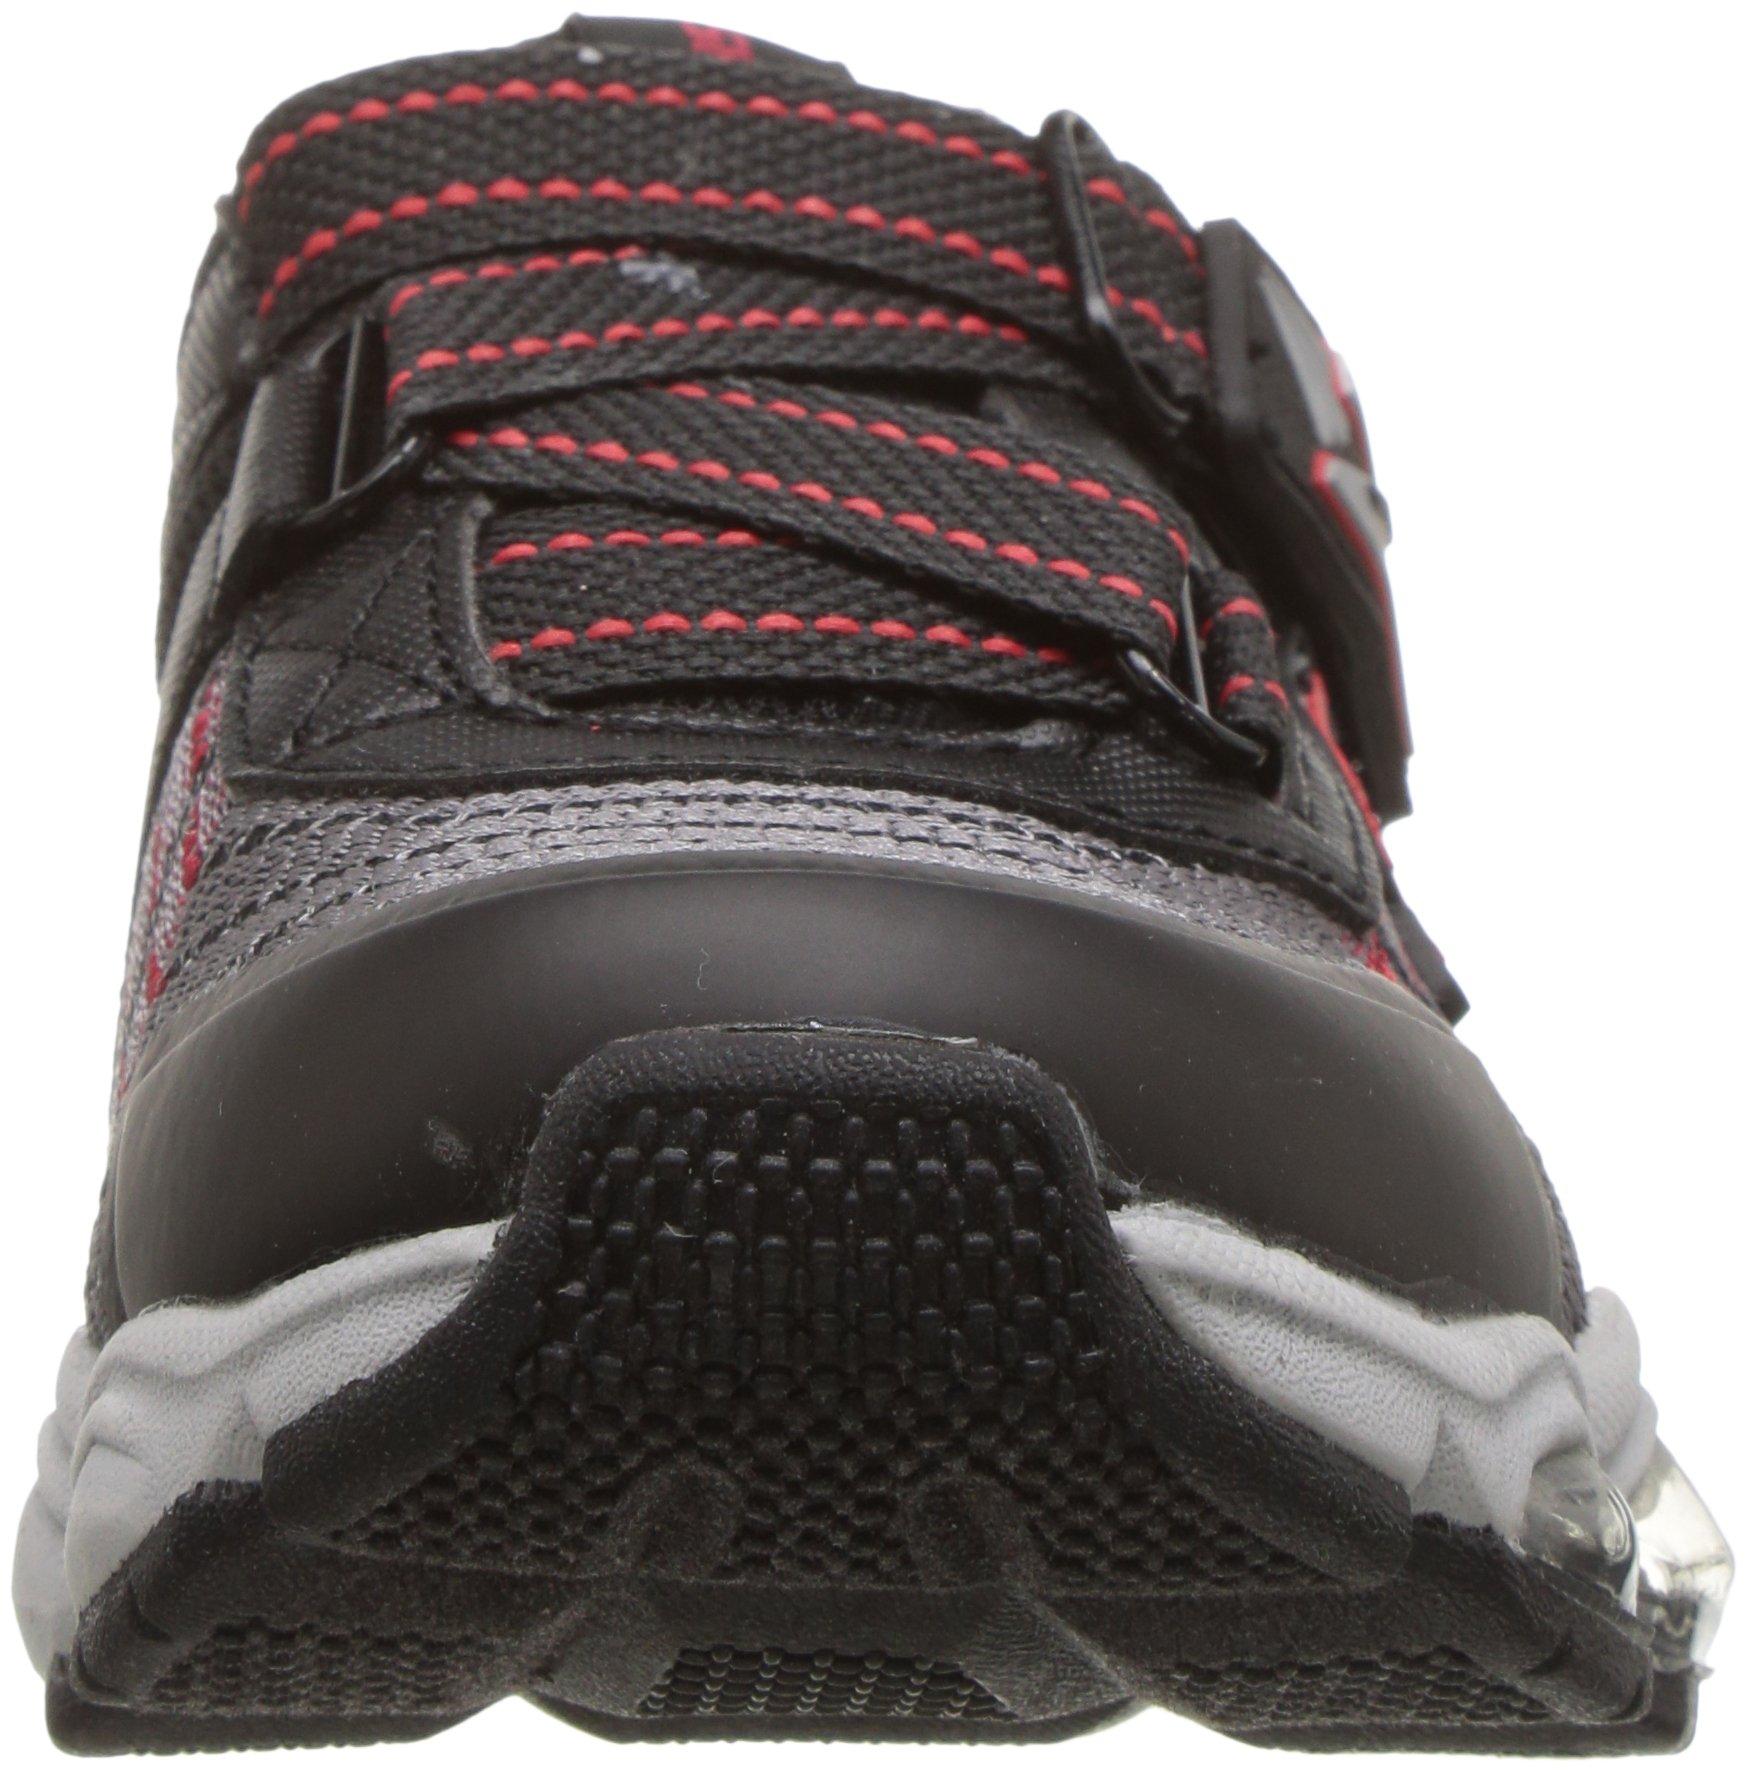 Skechers Kids Boys' Turbo-Flash-90596L Sneaker,Black/red,3 Medium US Little Kid by Skechers (Image #4)